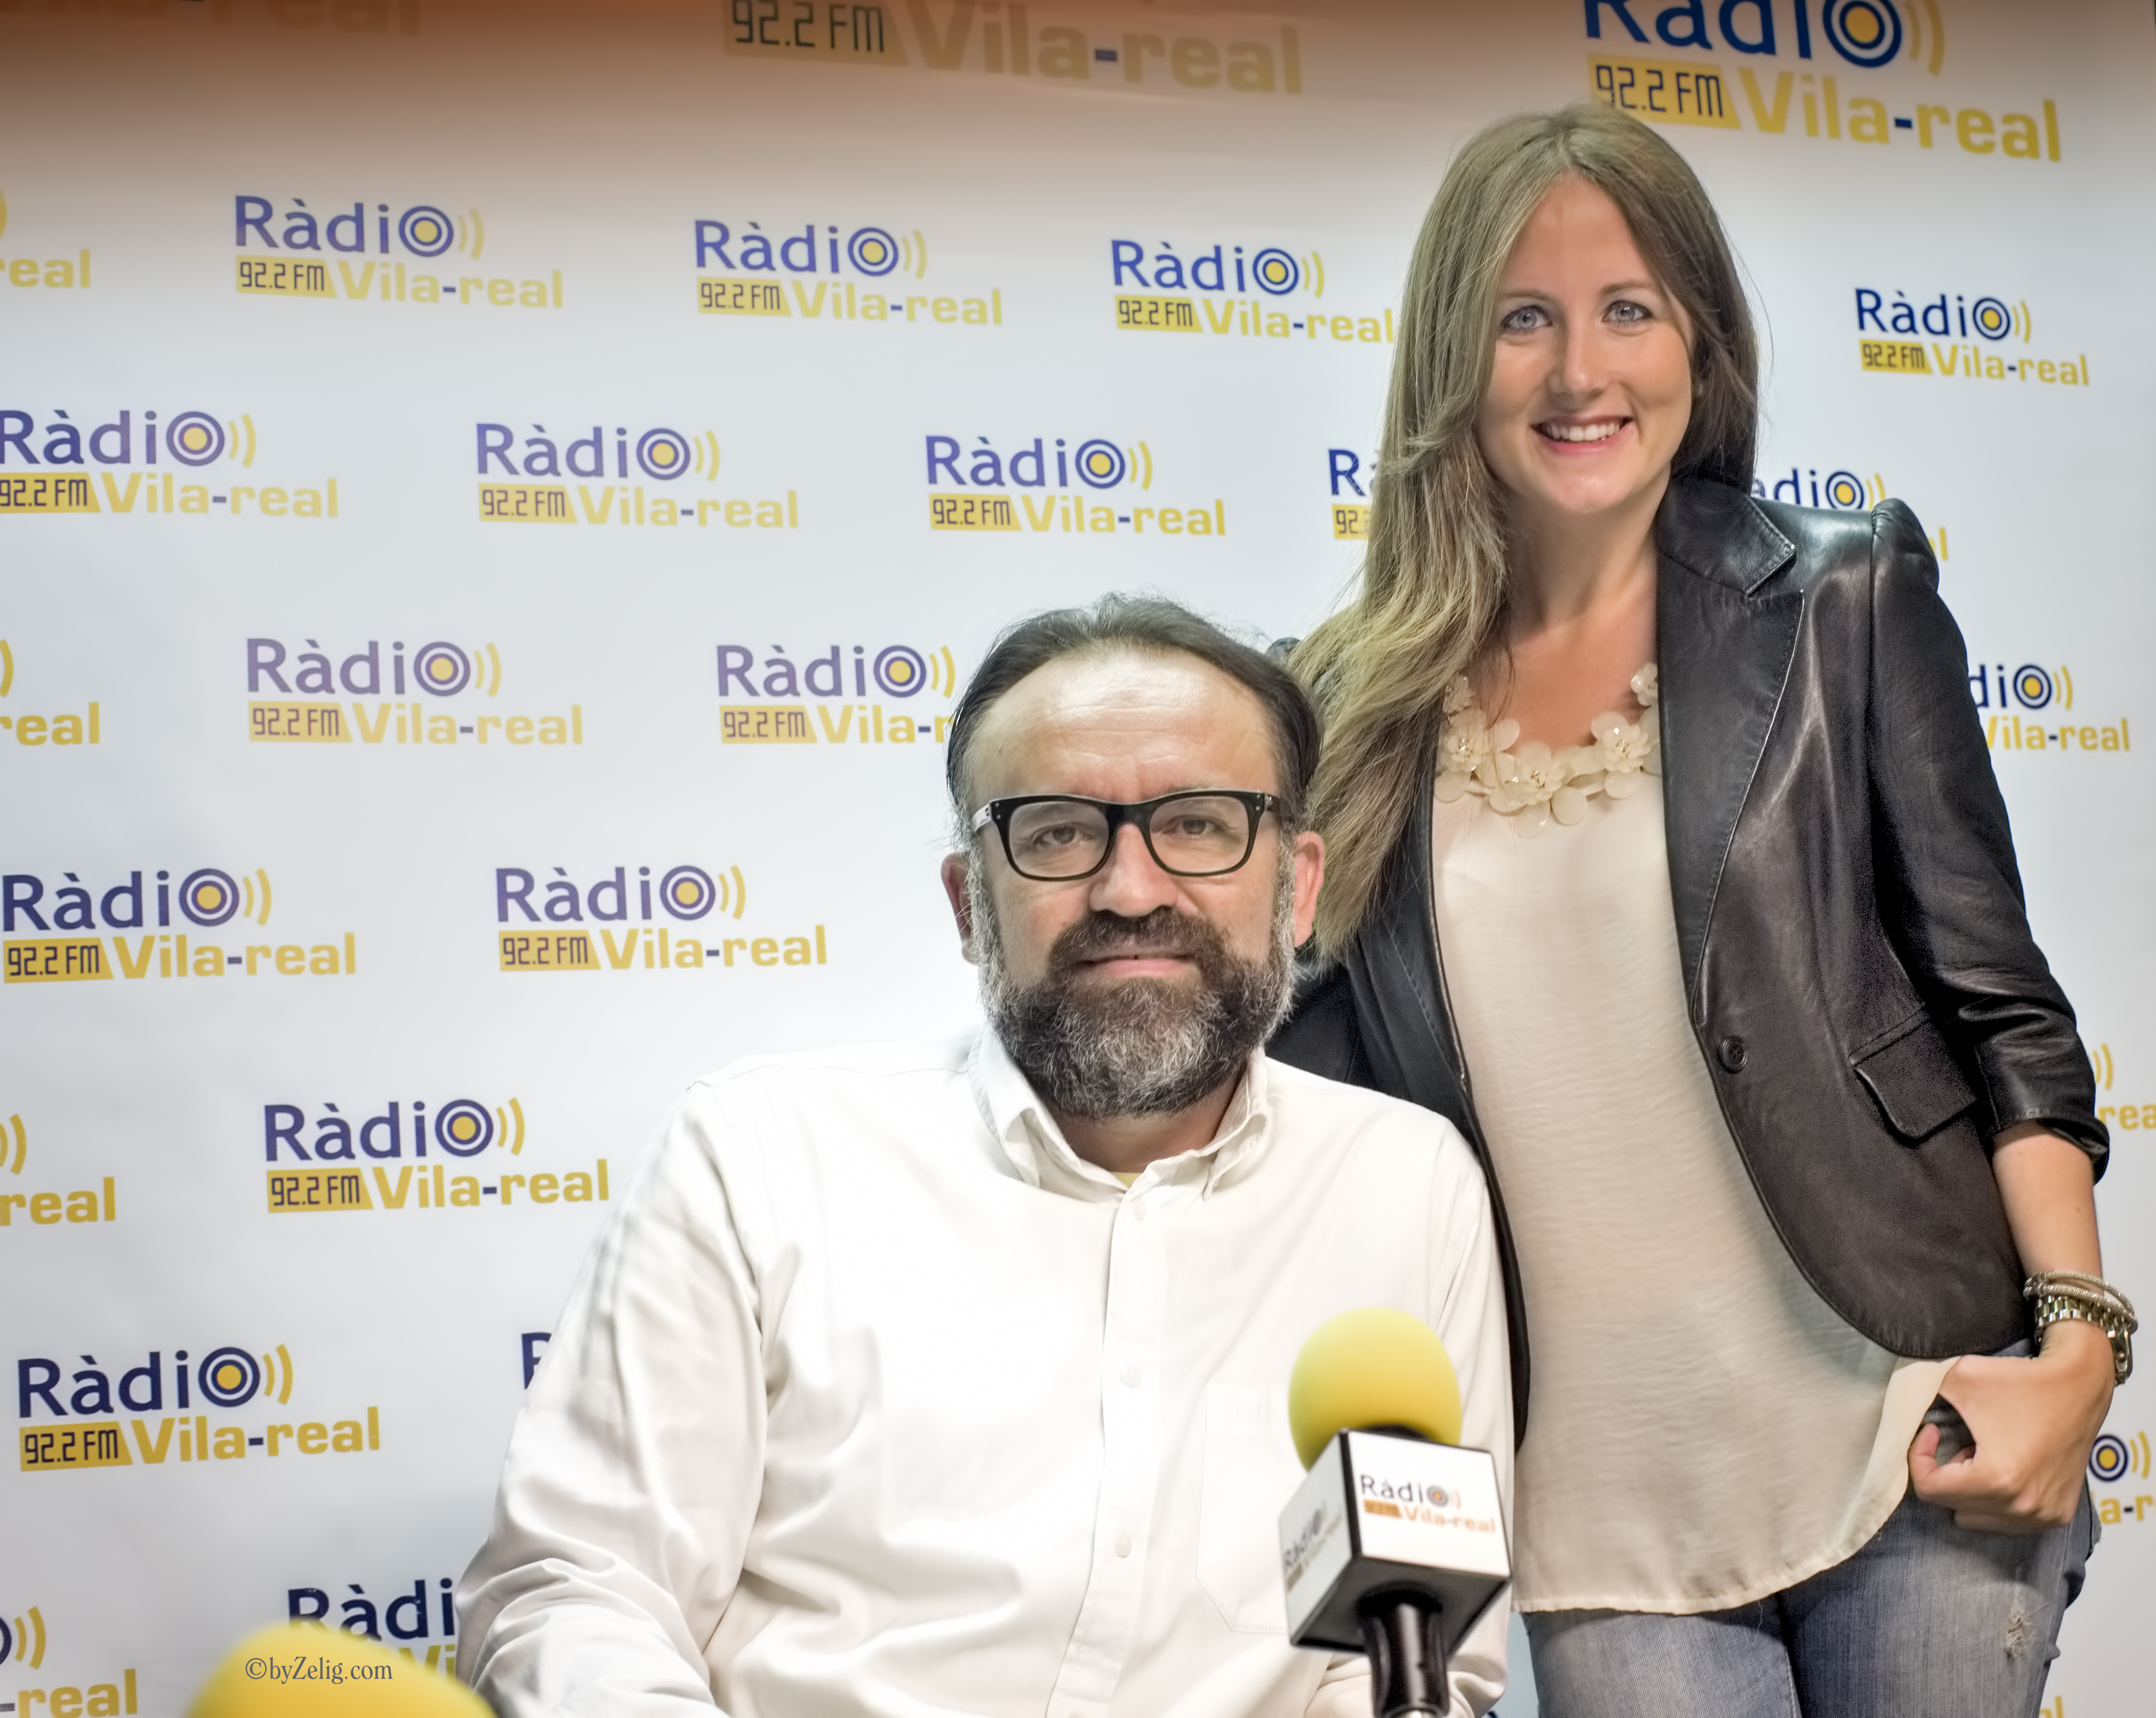 Esports Radio Vila-real. Programa del 14 de diciembre 2017